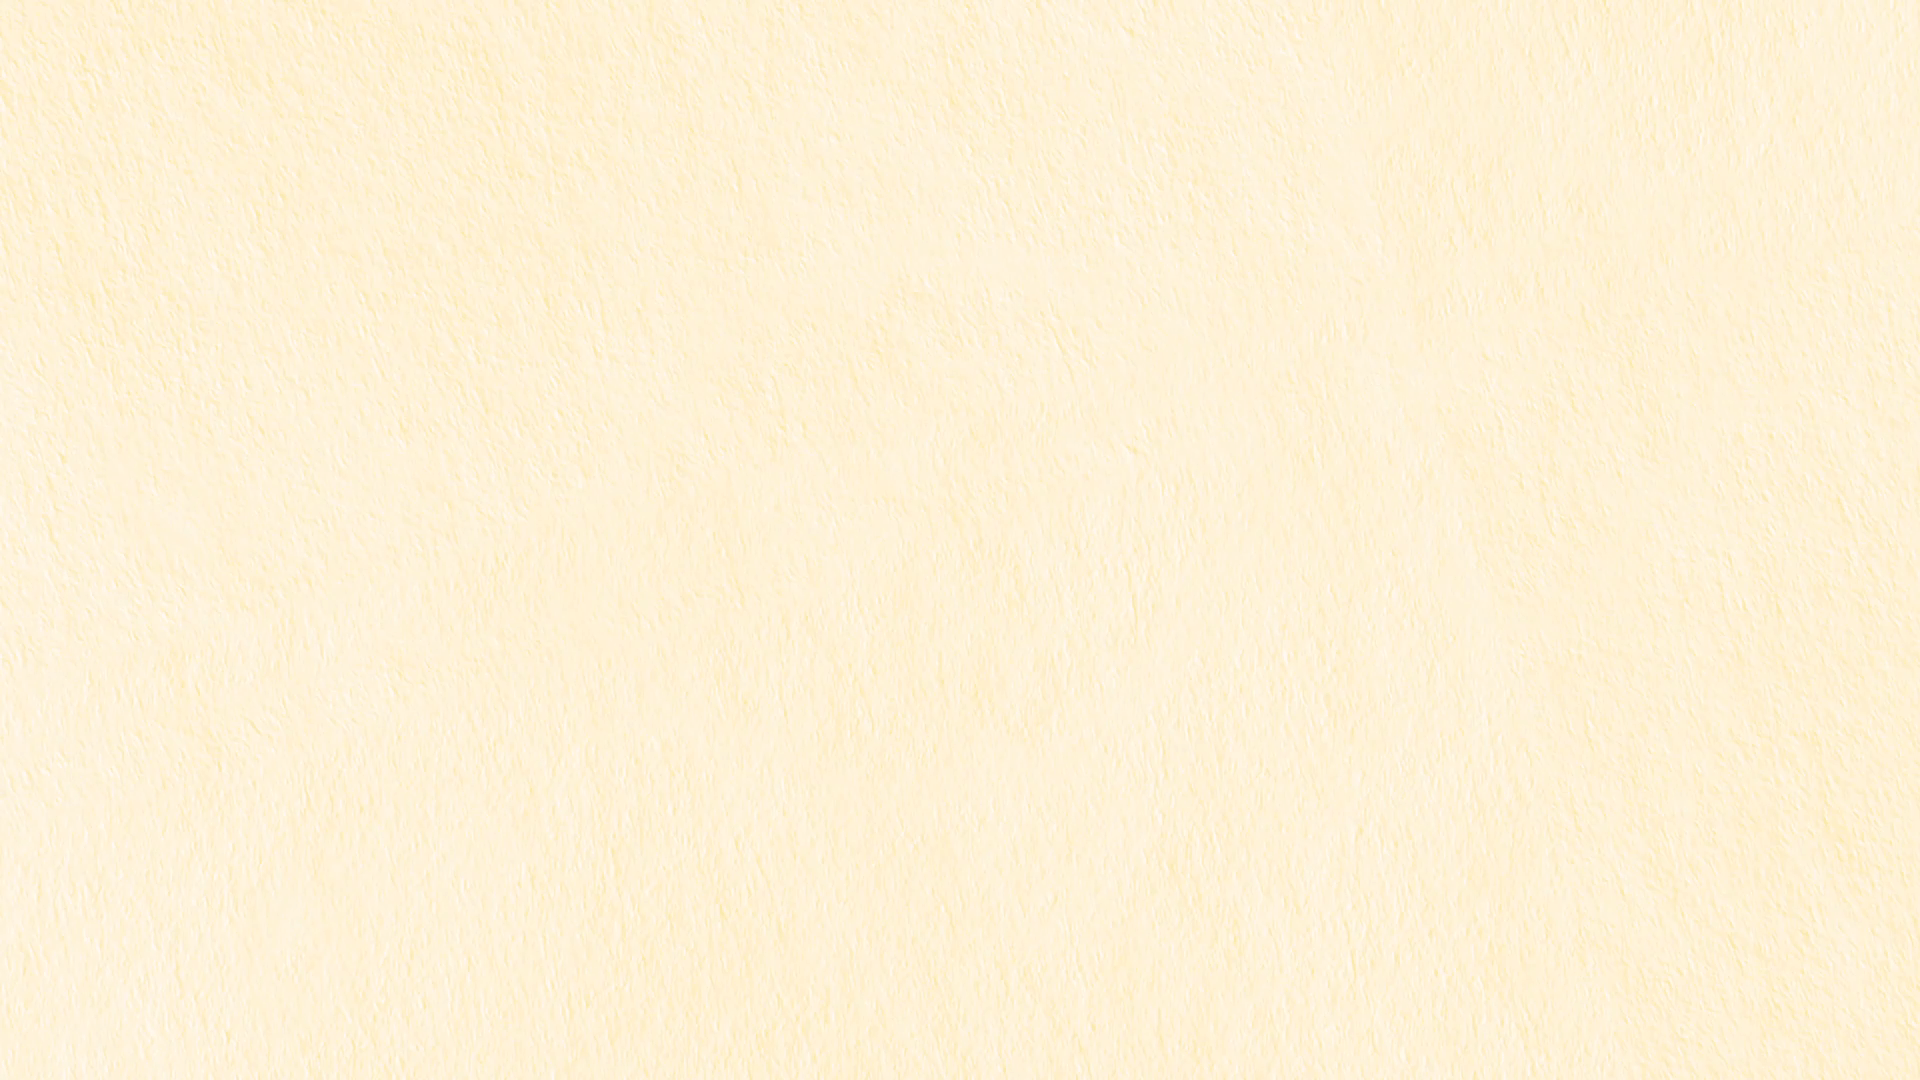 Texture Backgrounds - Wallpaper Cave